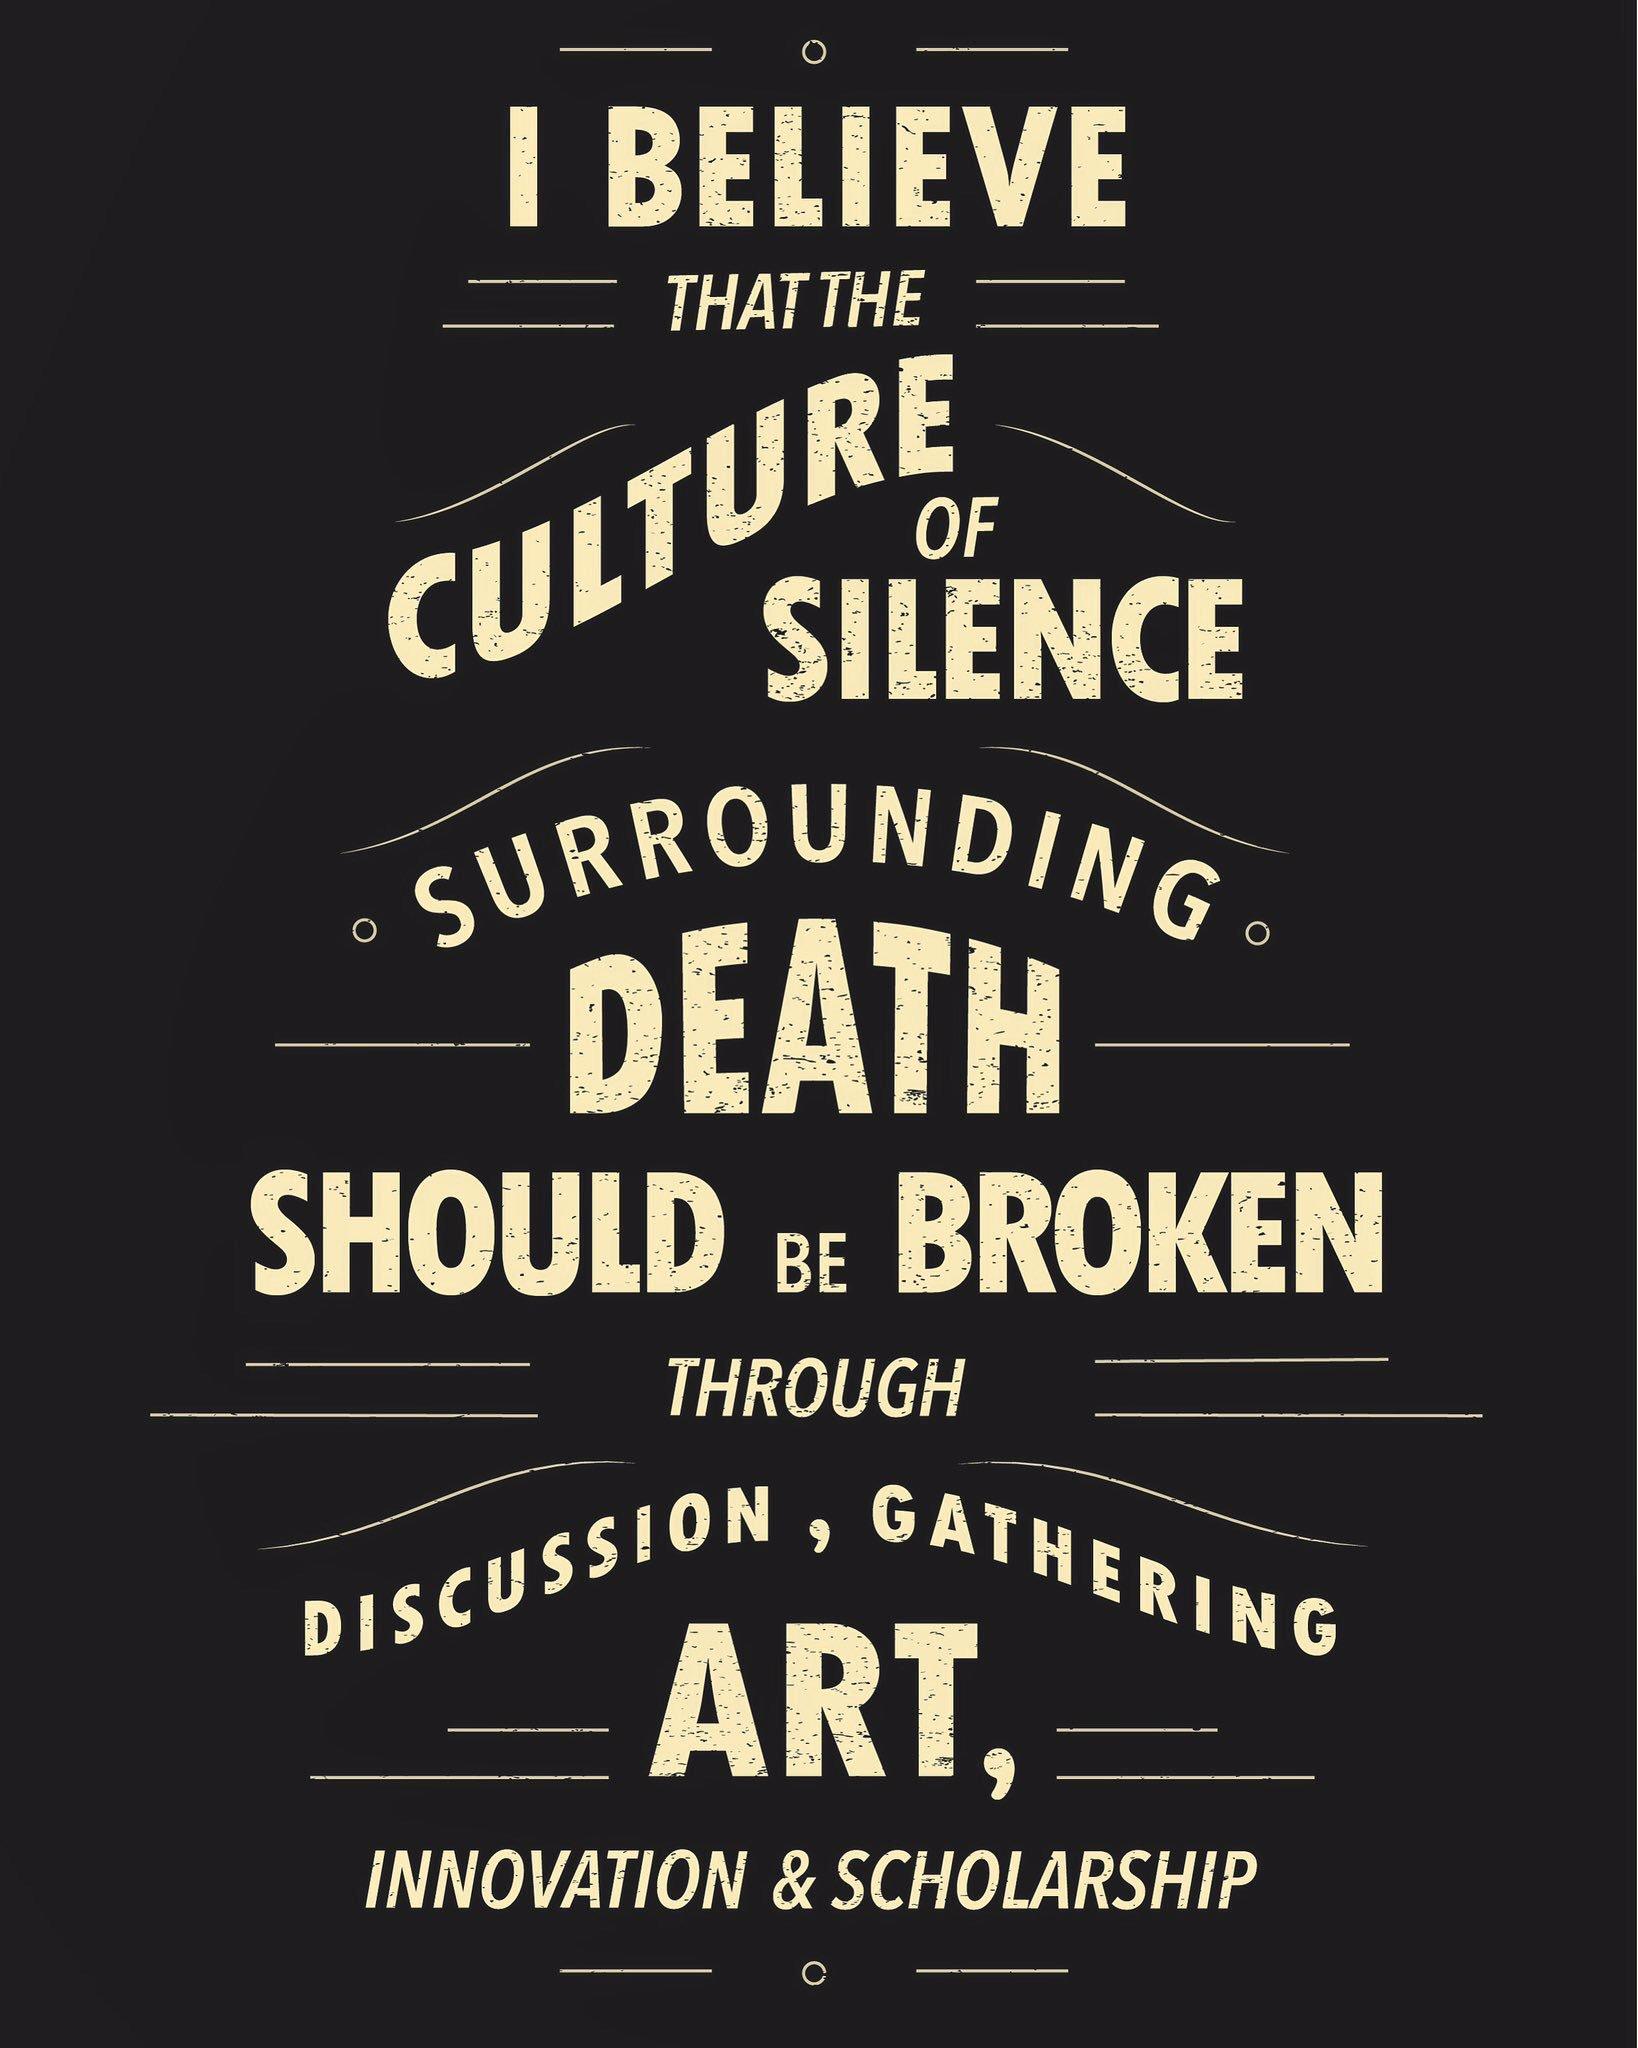 culture of silence.jpeg